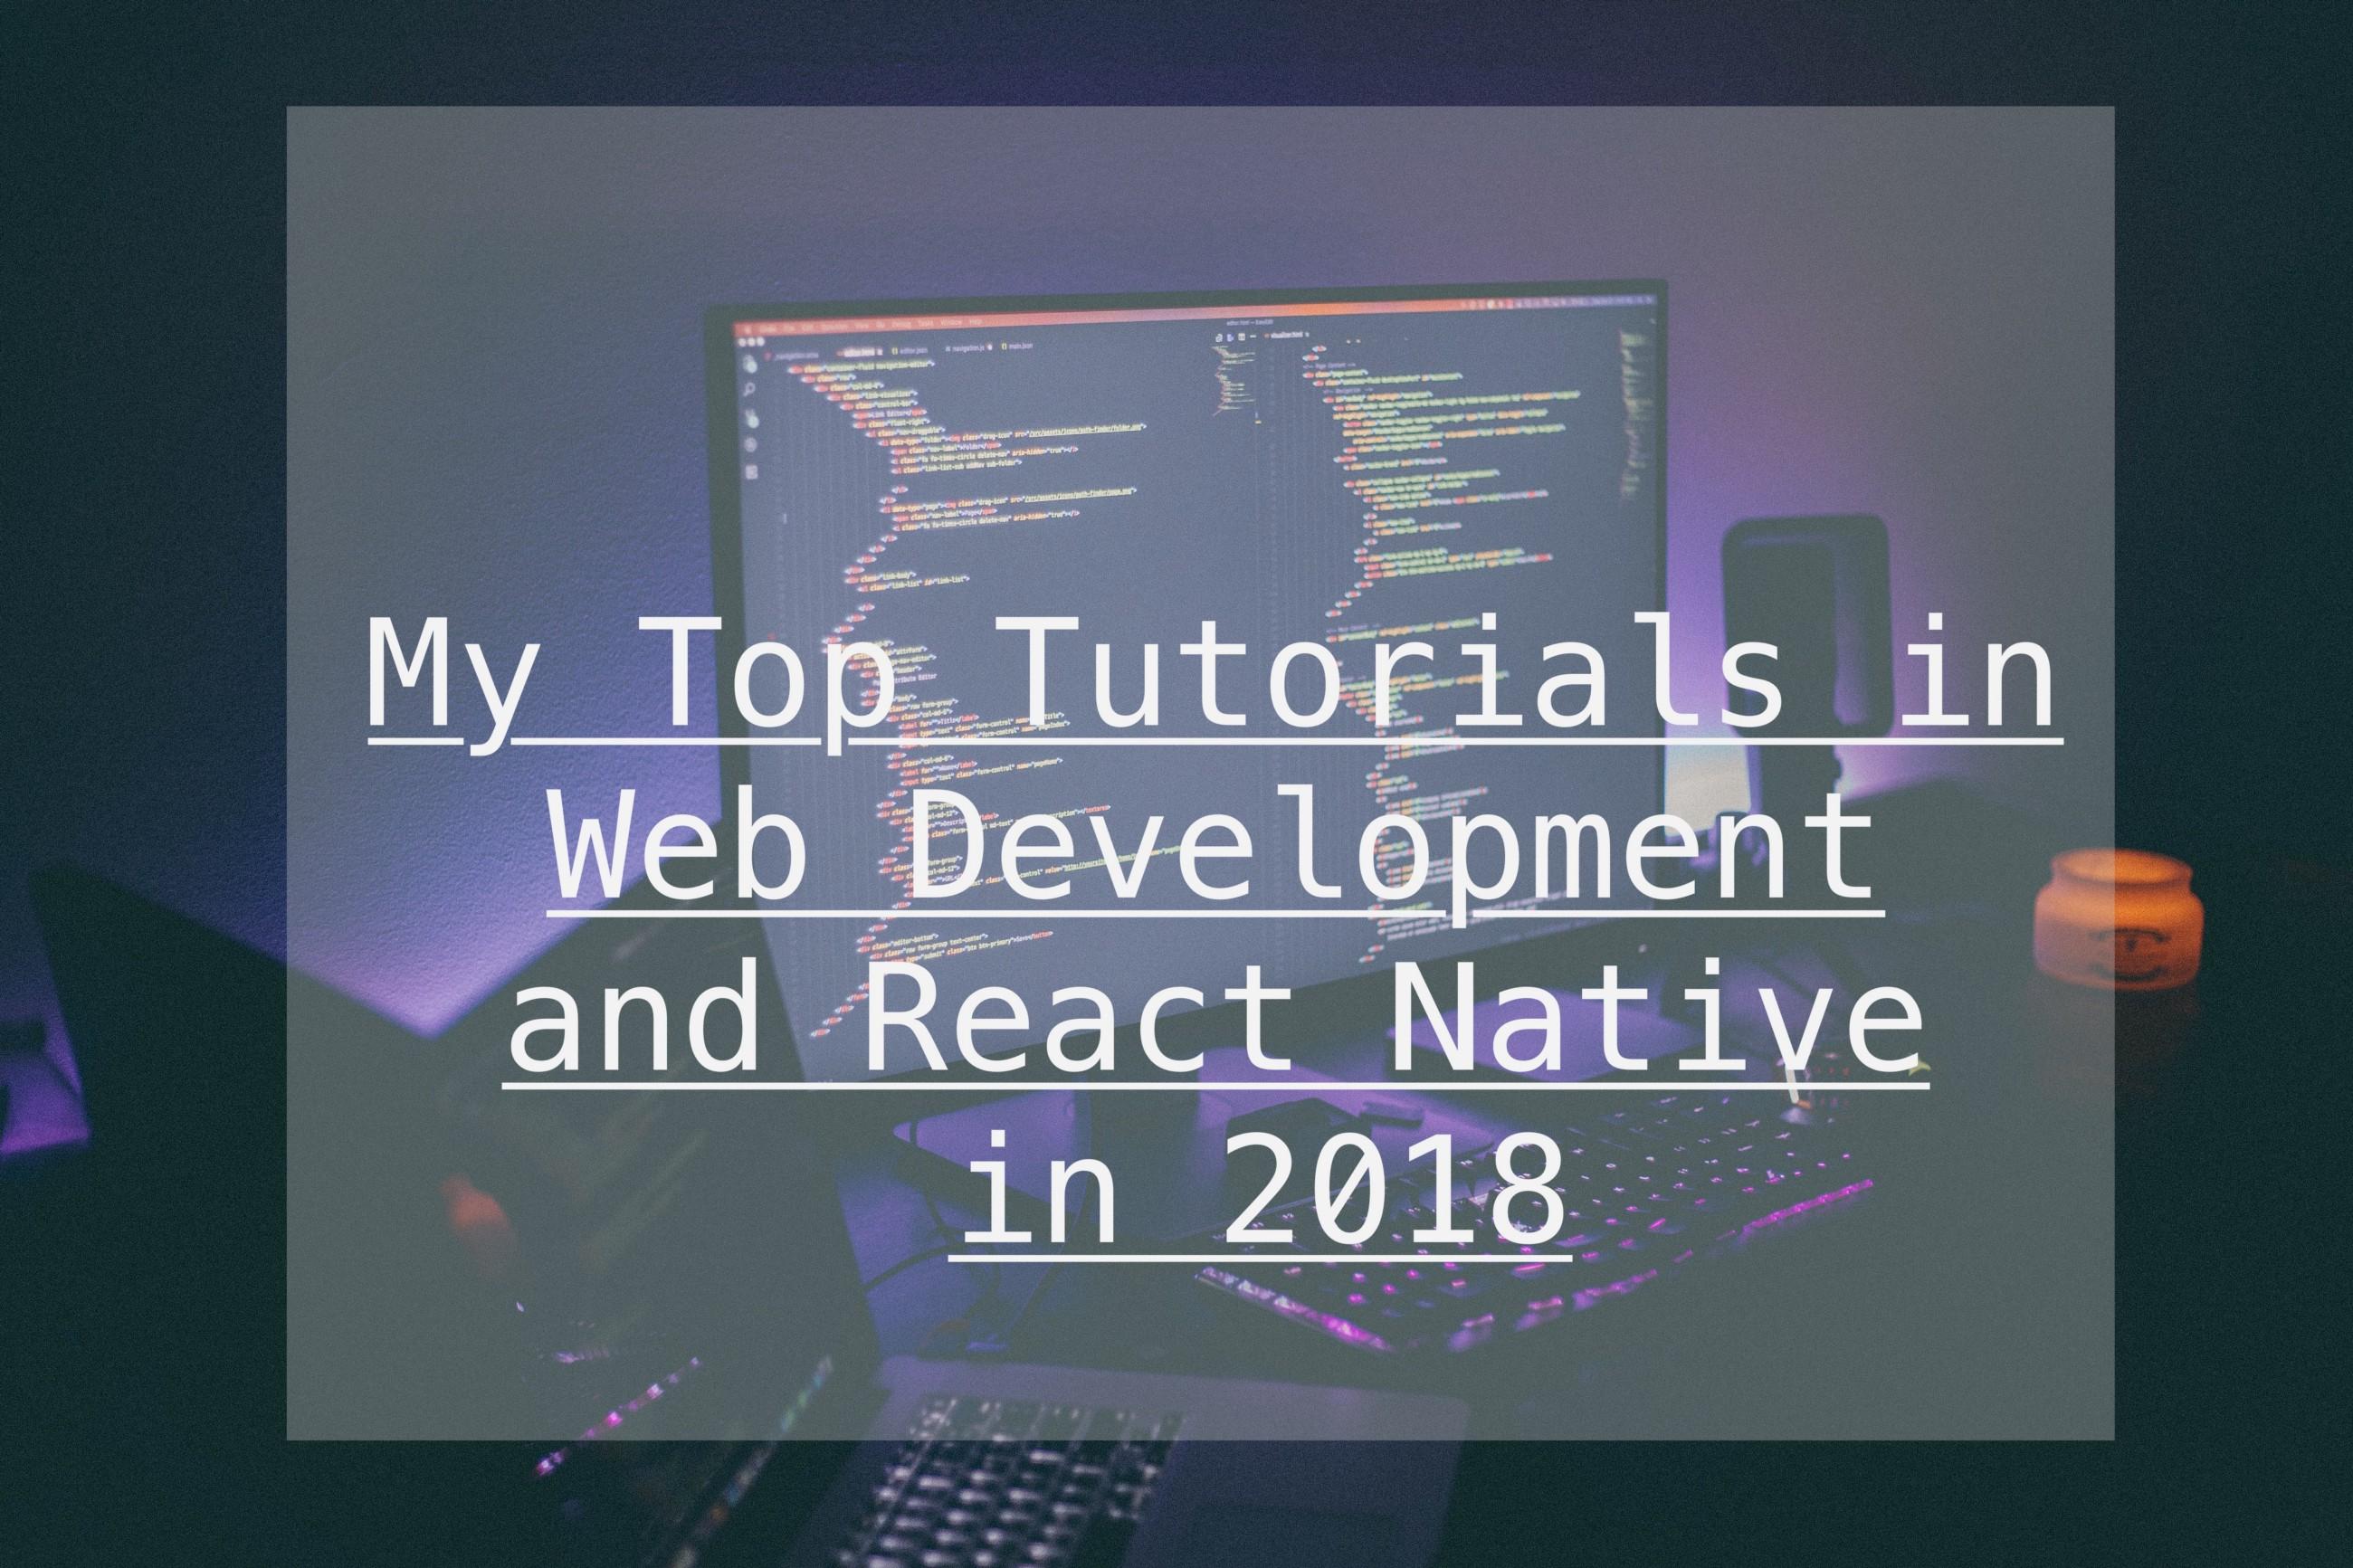 /my-top-tutorials-in-web-development-and-react-native-in-2018-627da9e0481f feature image